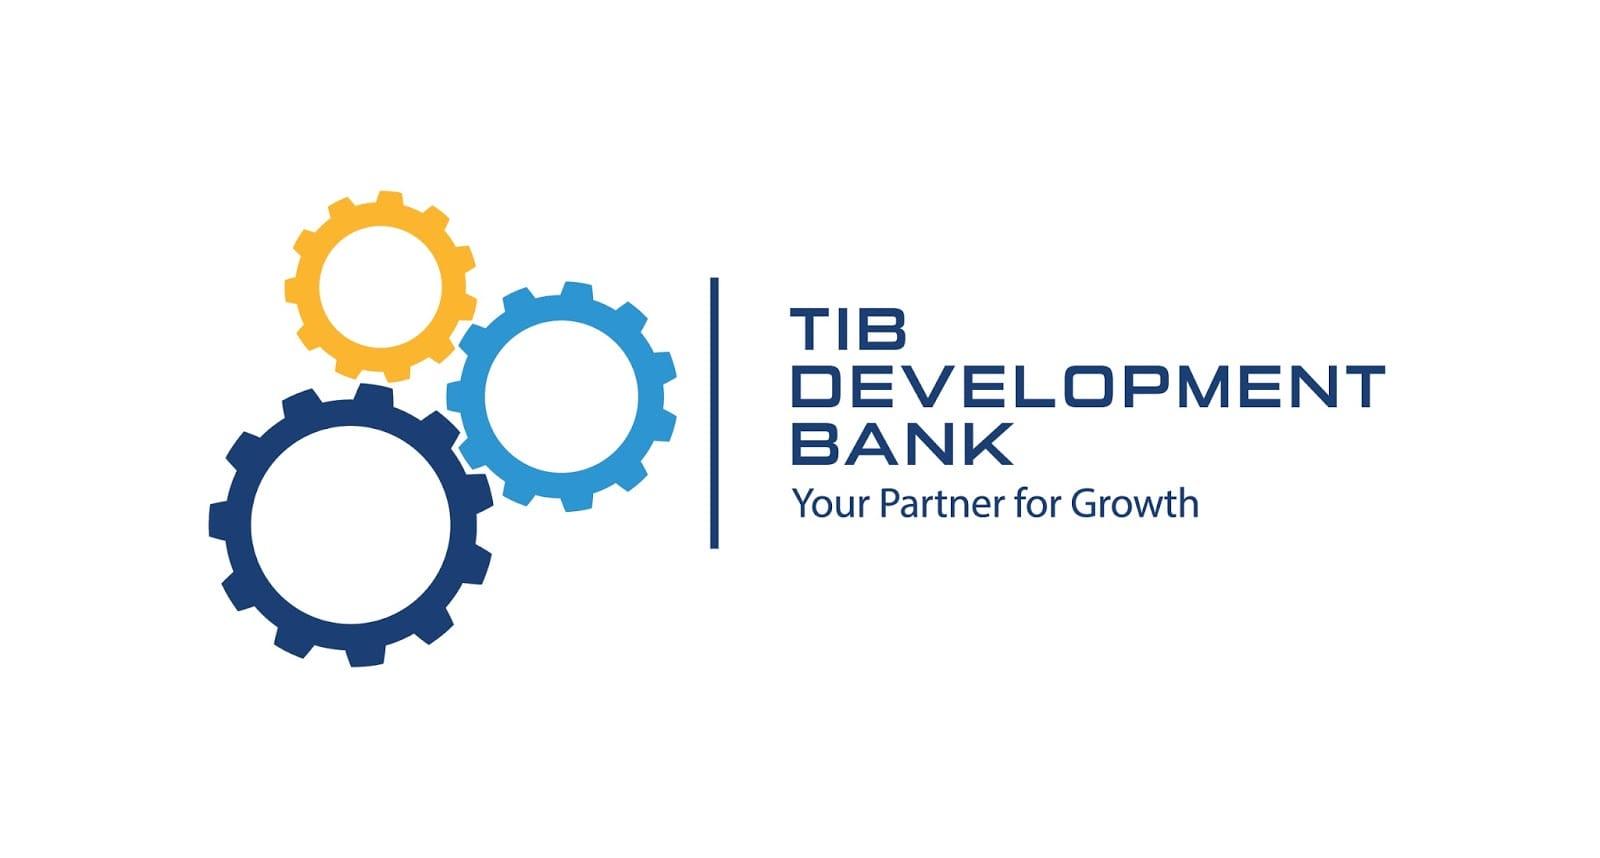 Tanzania Investiment Bank